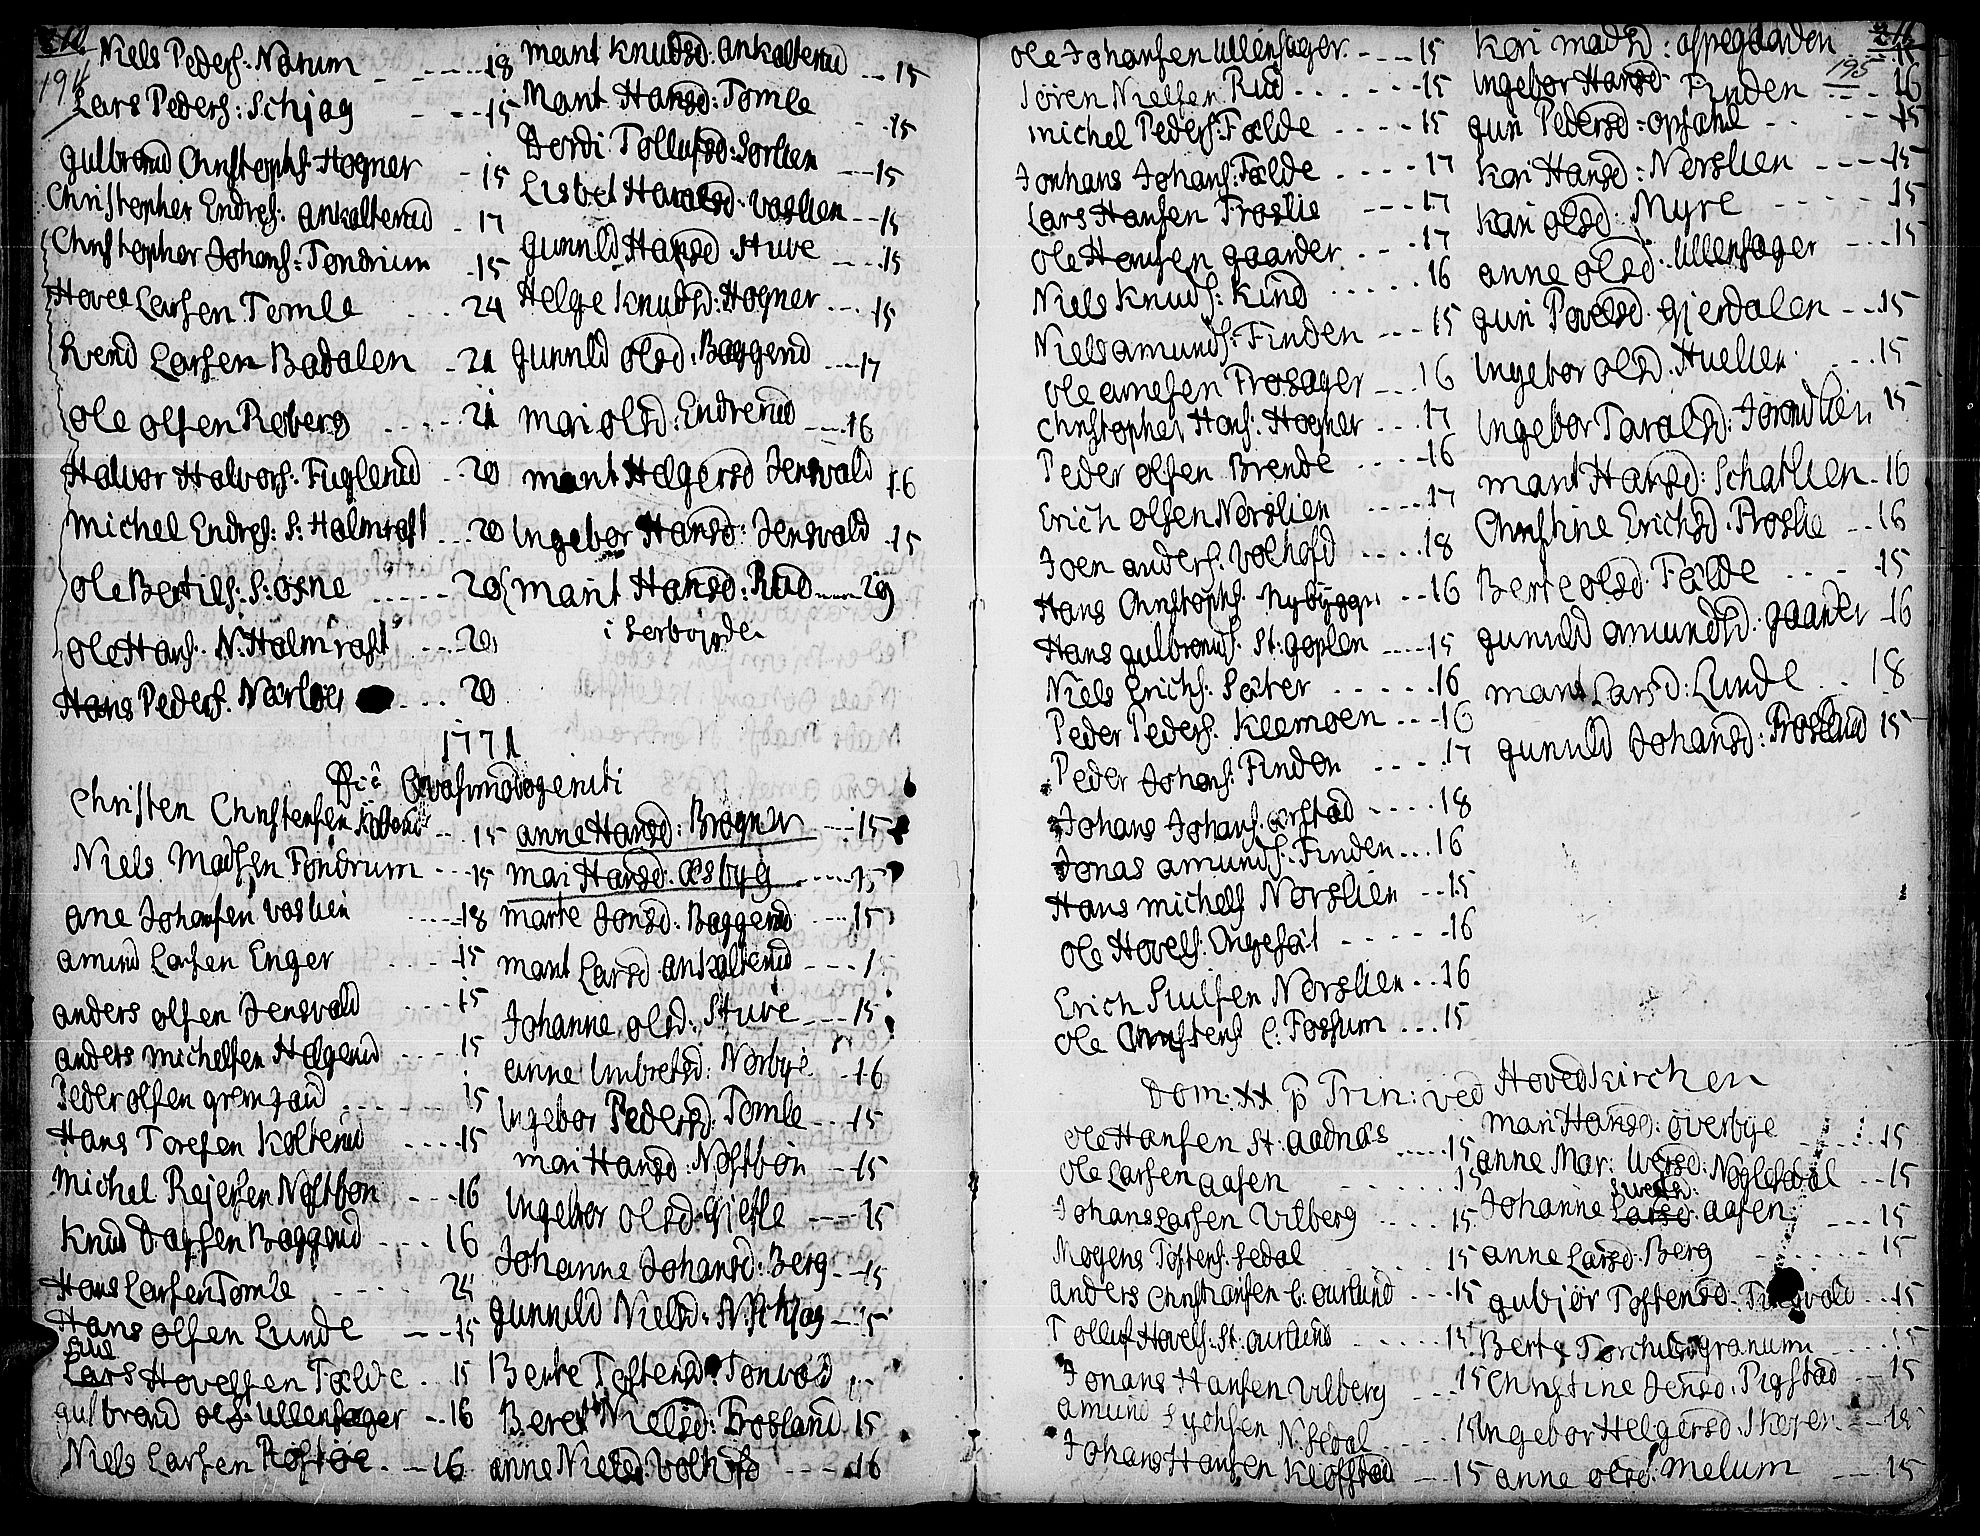 SAH, Land prestekontor, Ministerialbok nr. 5, 1765-1784, s. 194-195